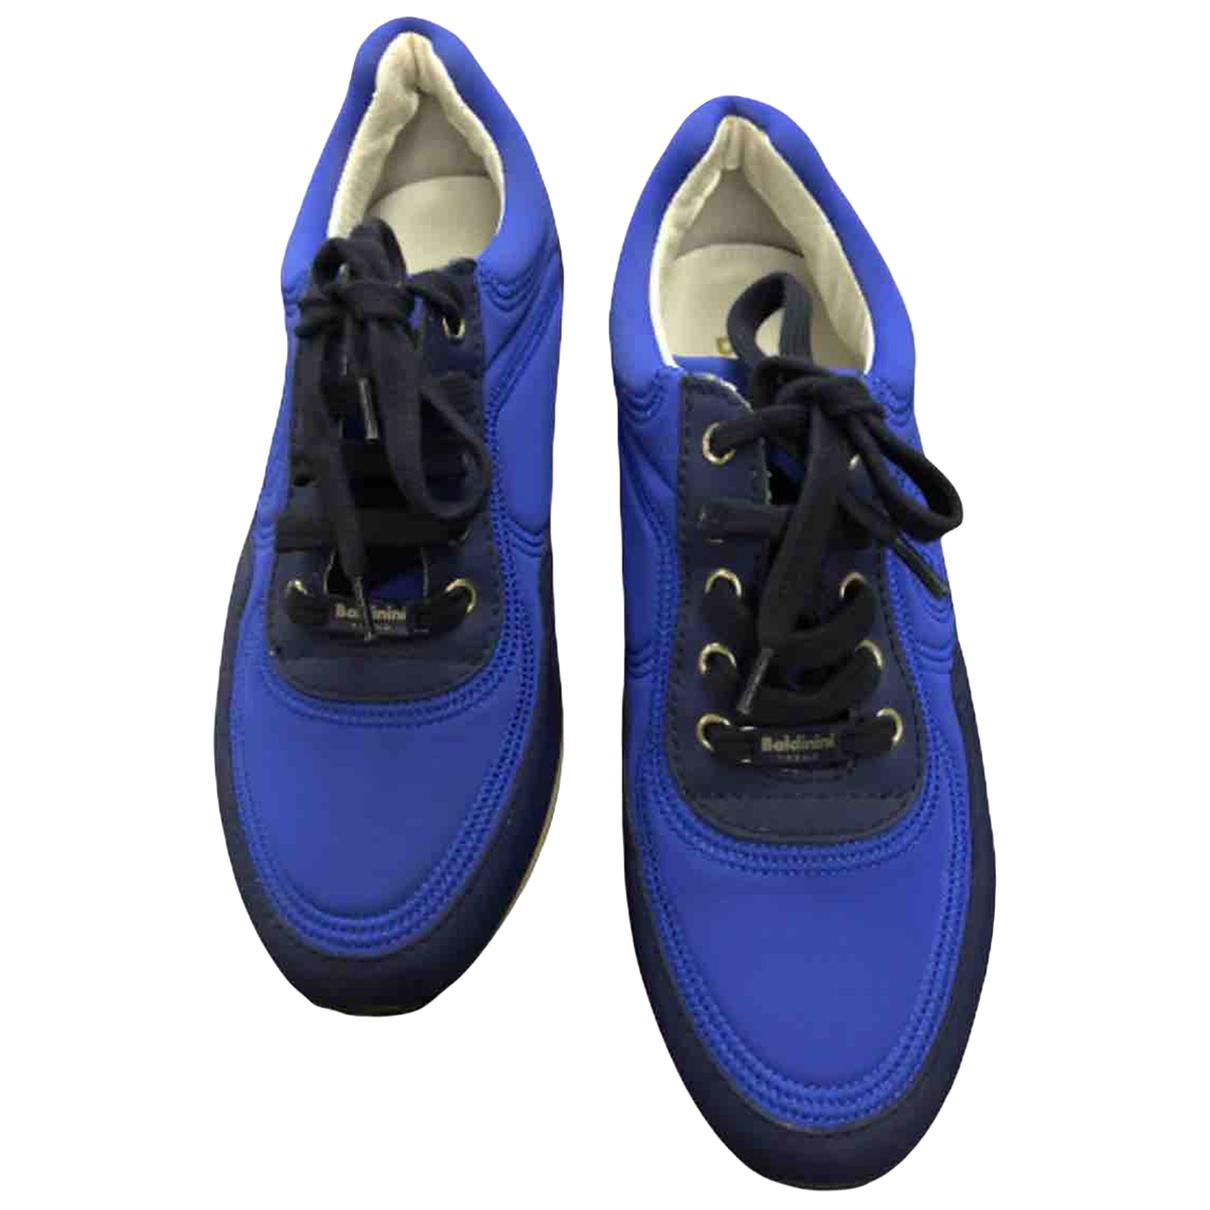 Baldinini N Blue Cloth Trainers for Women 36 EU